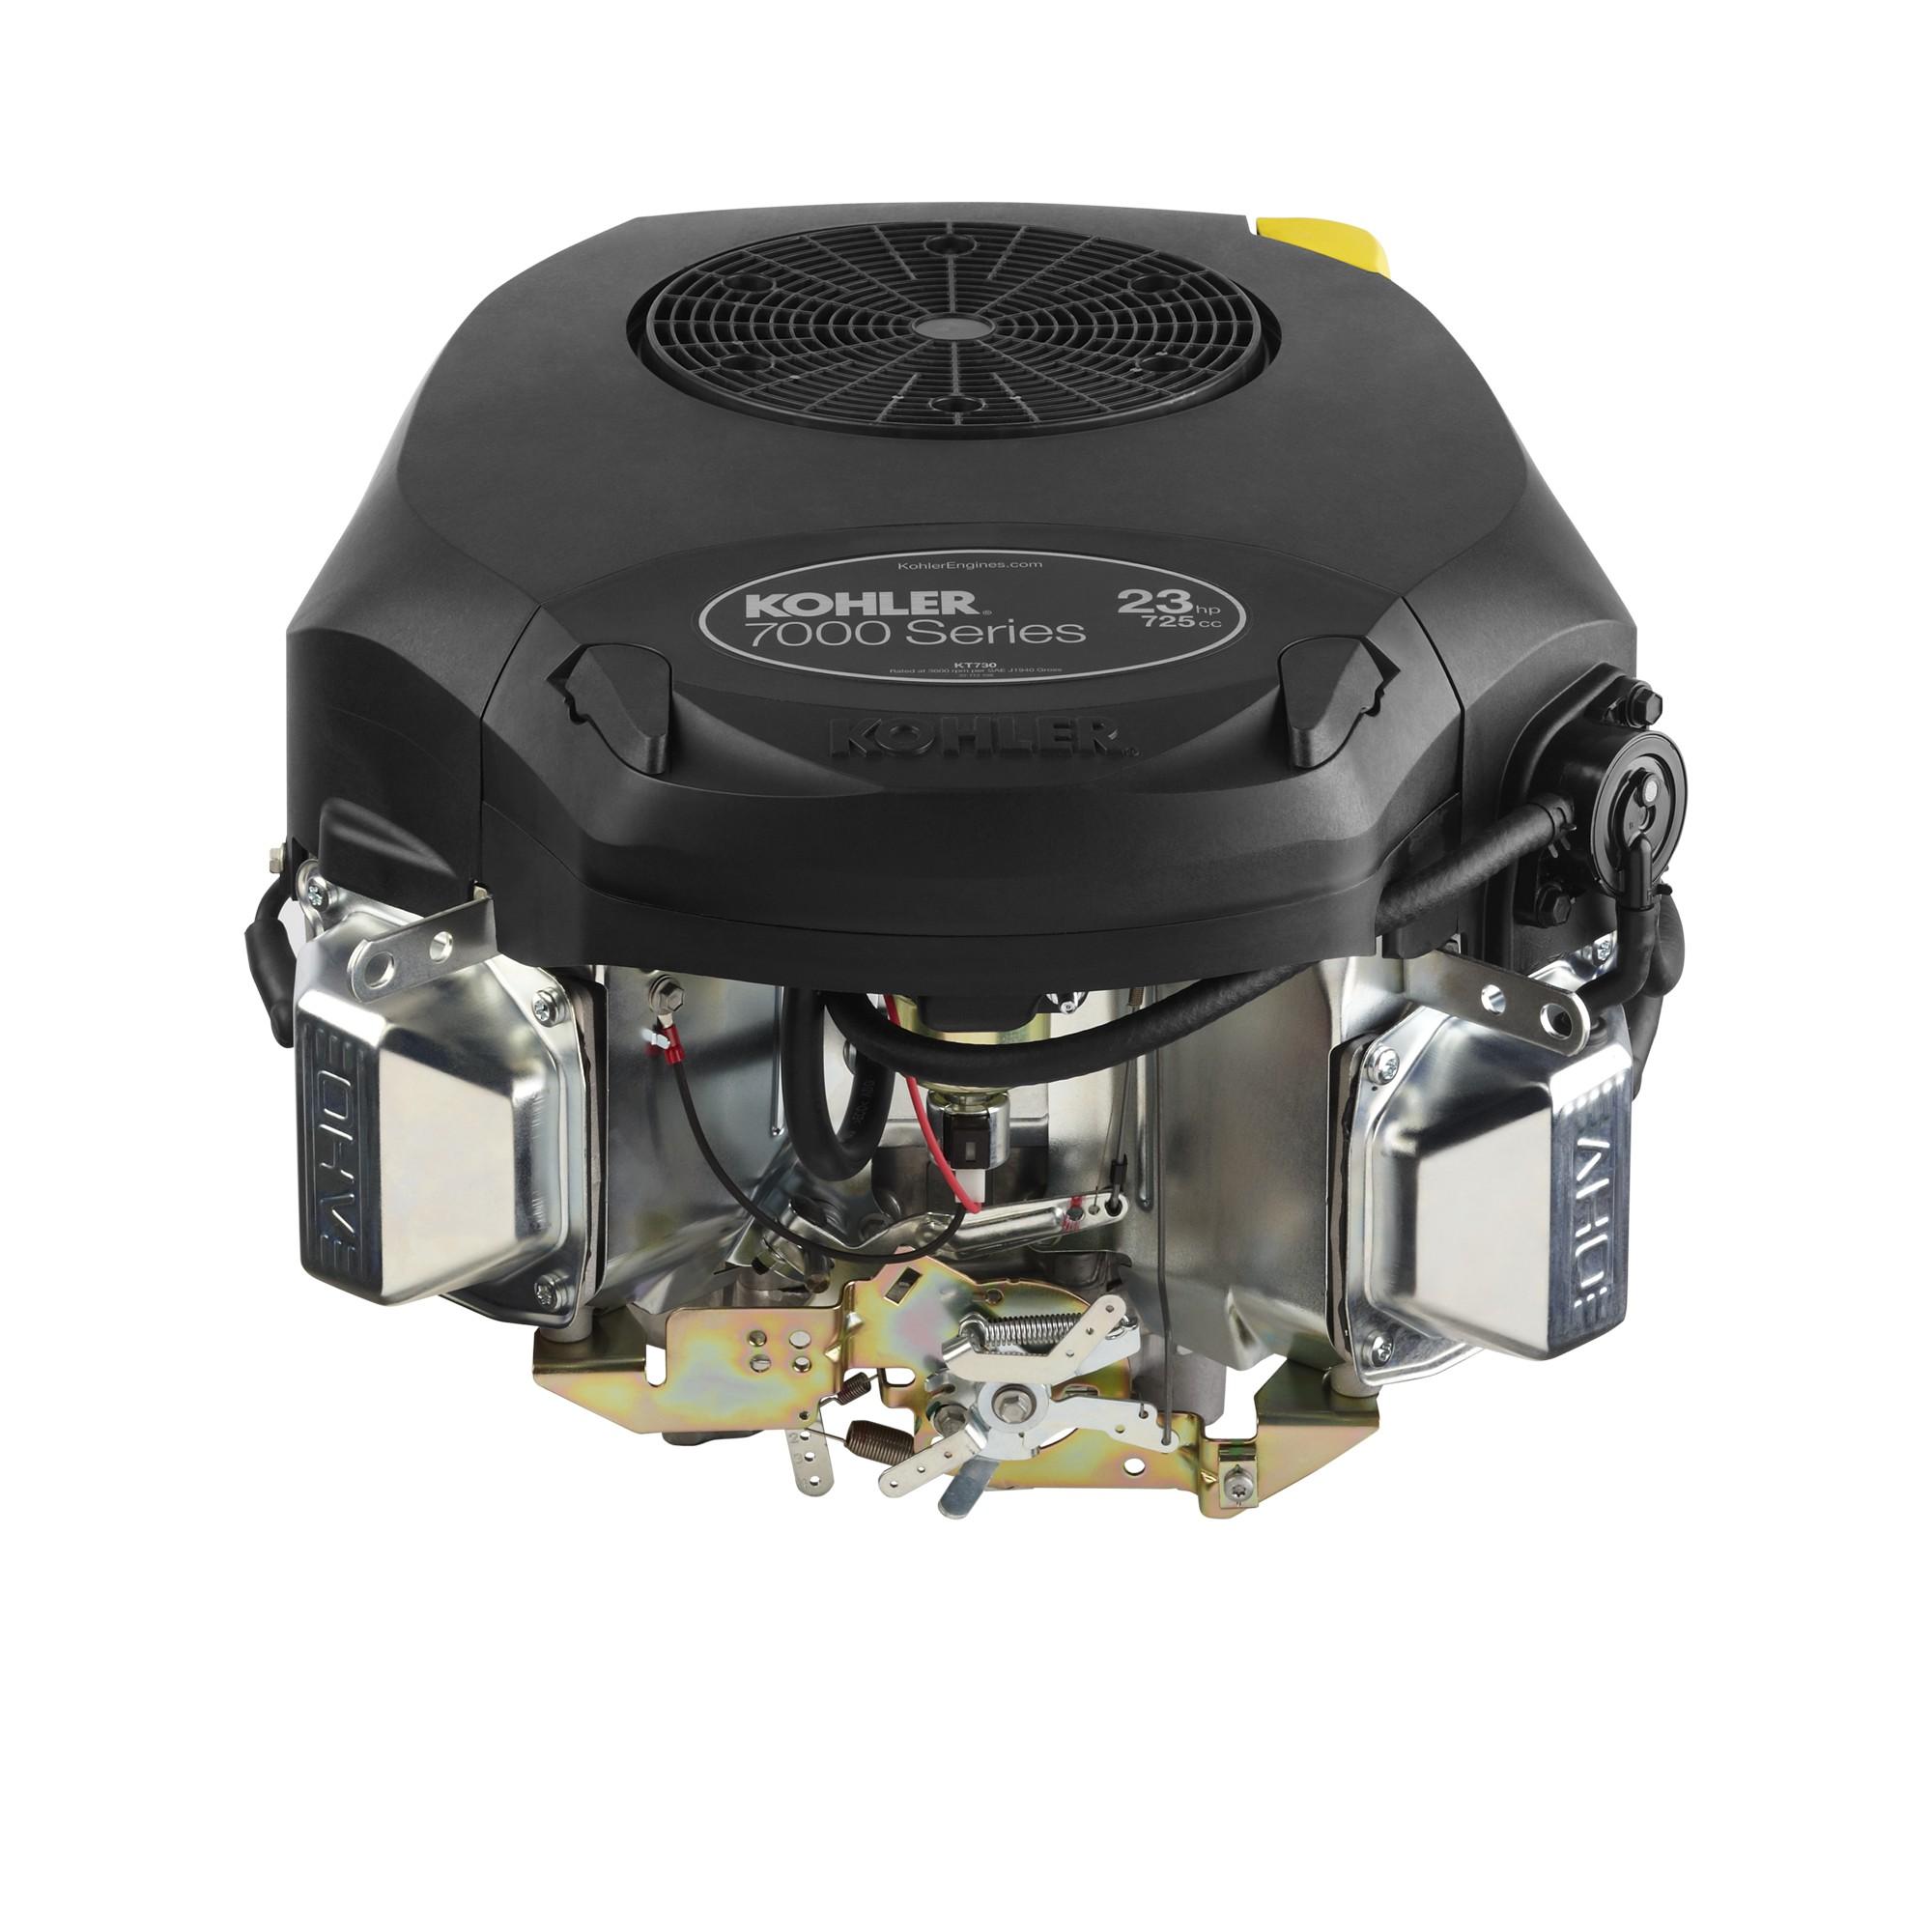 kohler engines kt725 7000 series product detail engines Kohler RV Generator Wiring Diagram